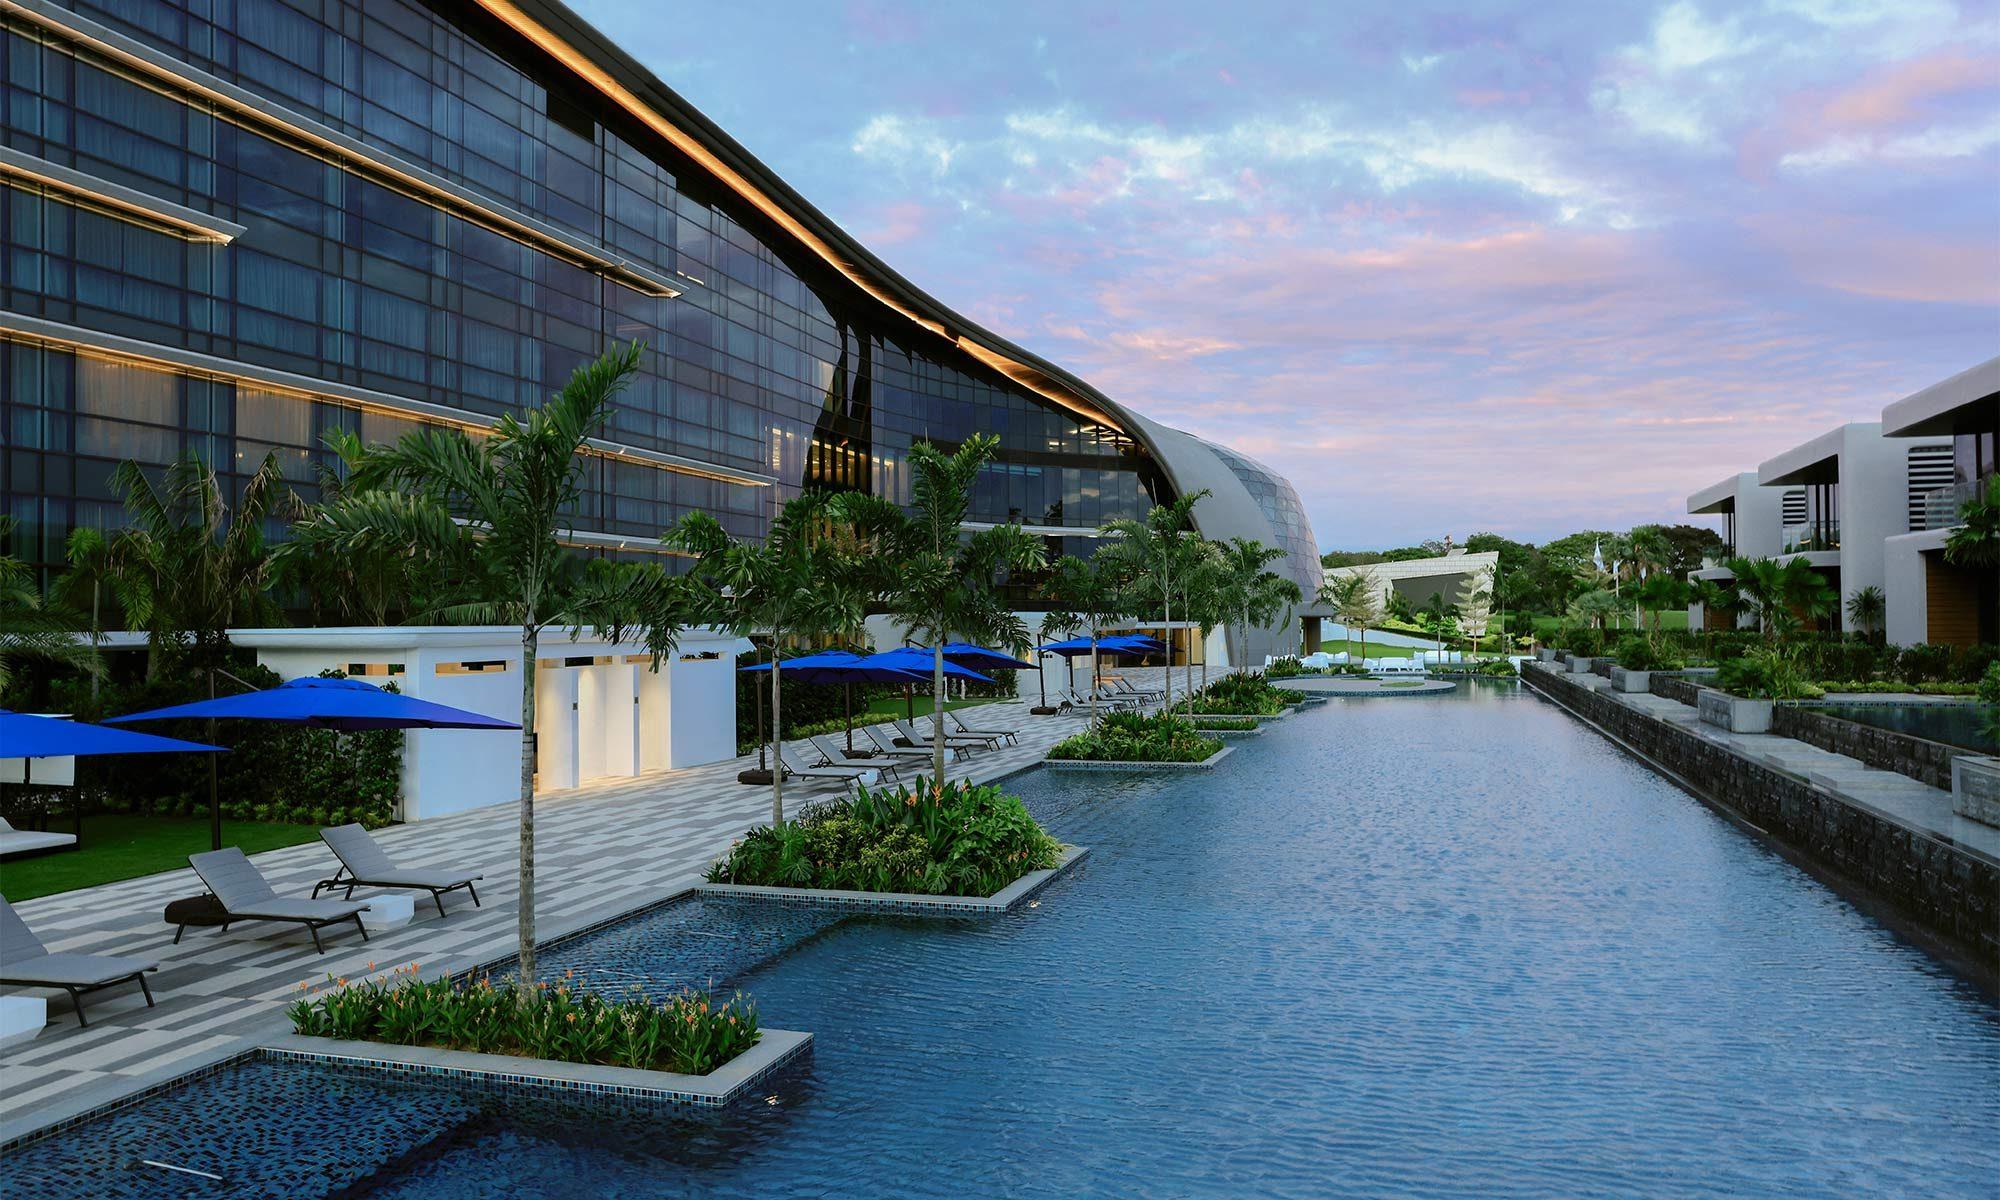 dusitthani-laguna-singapore